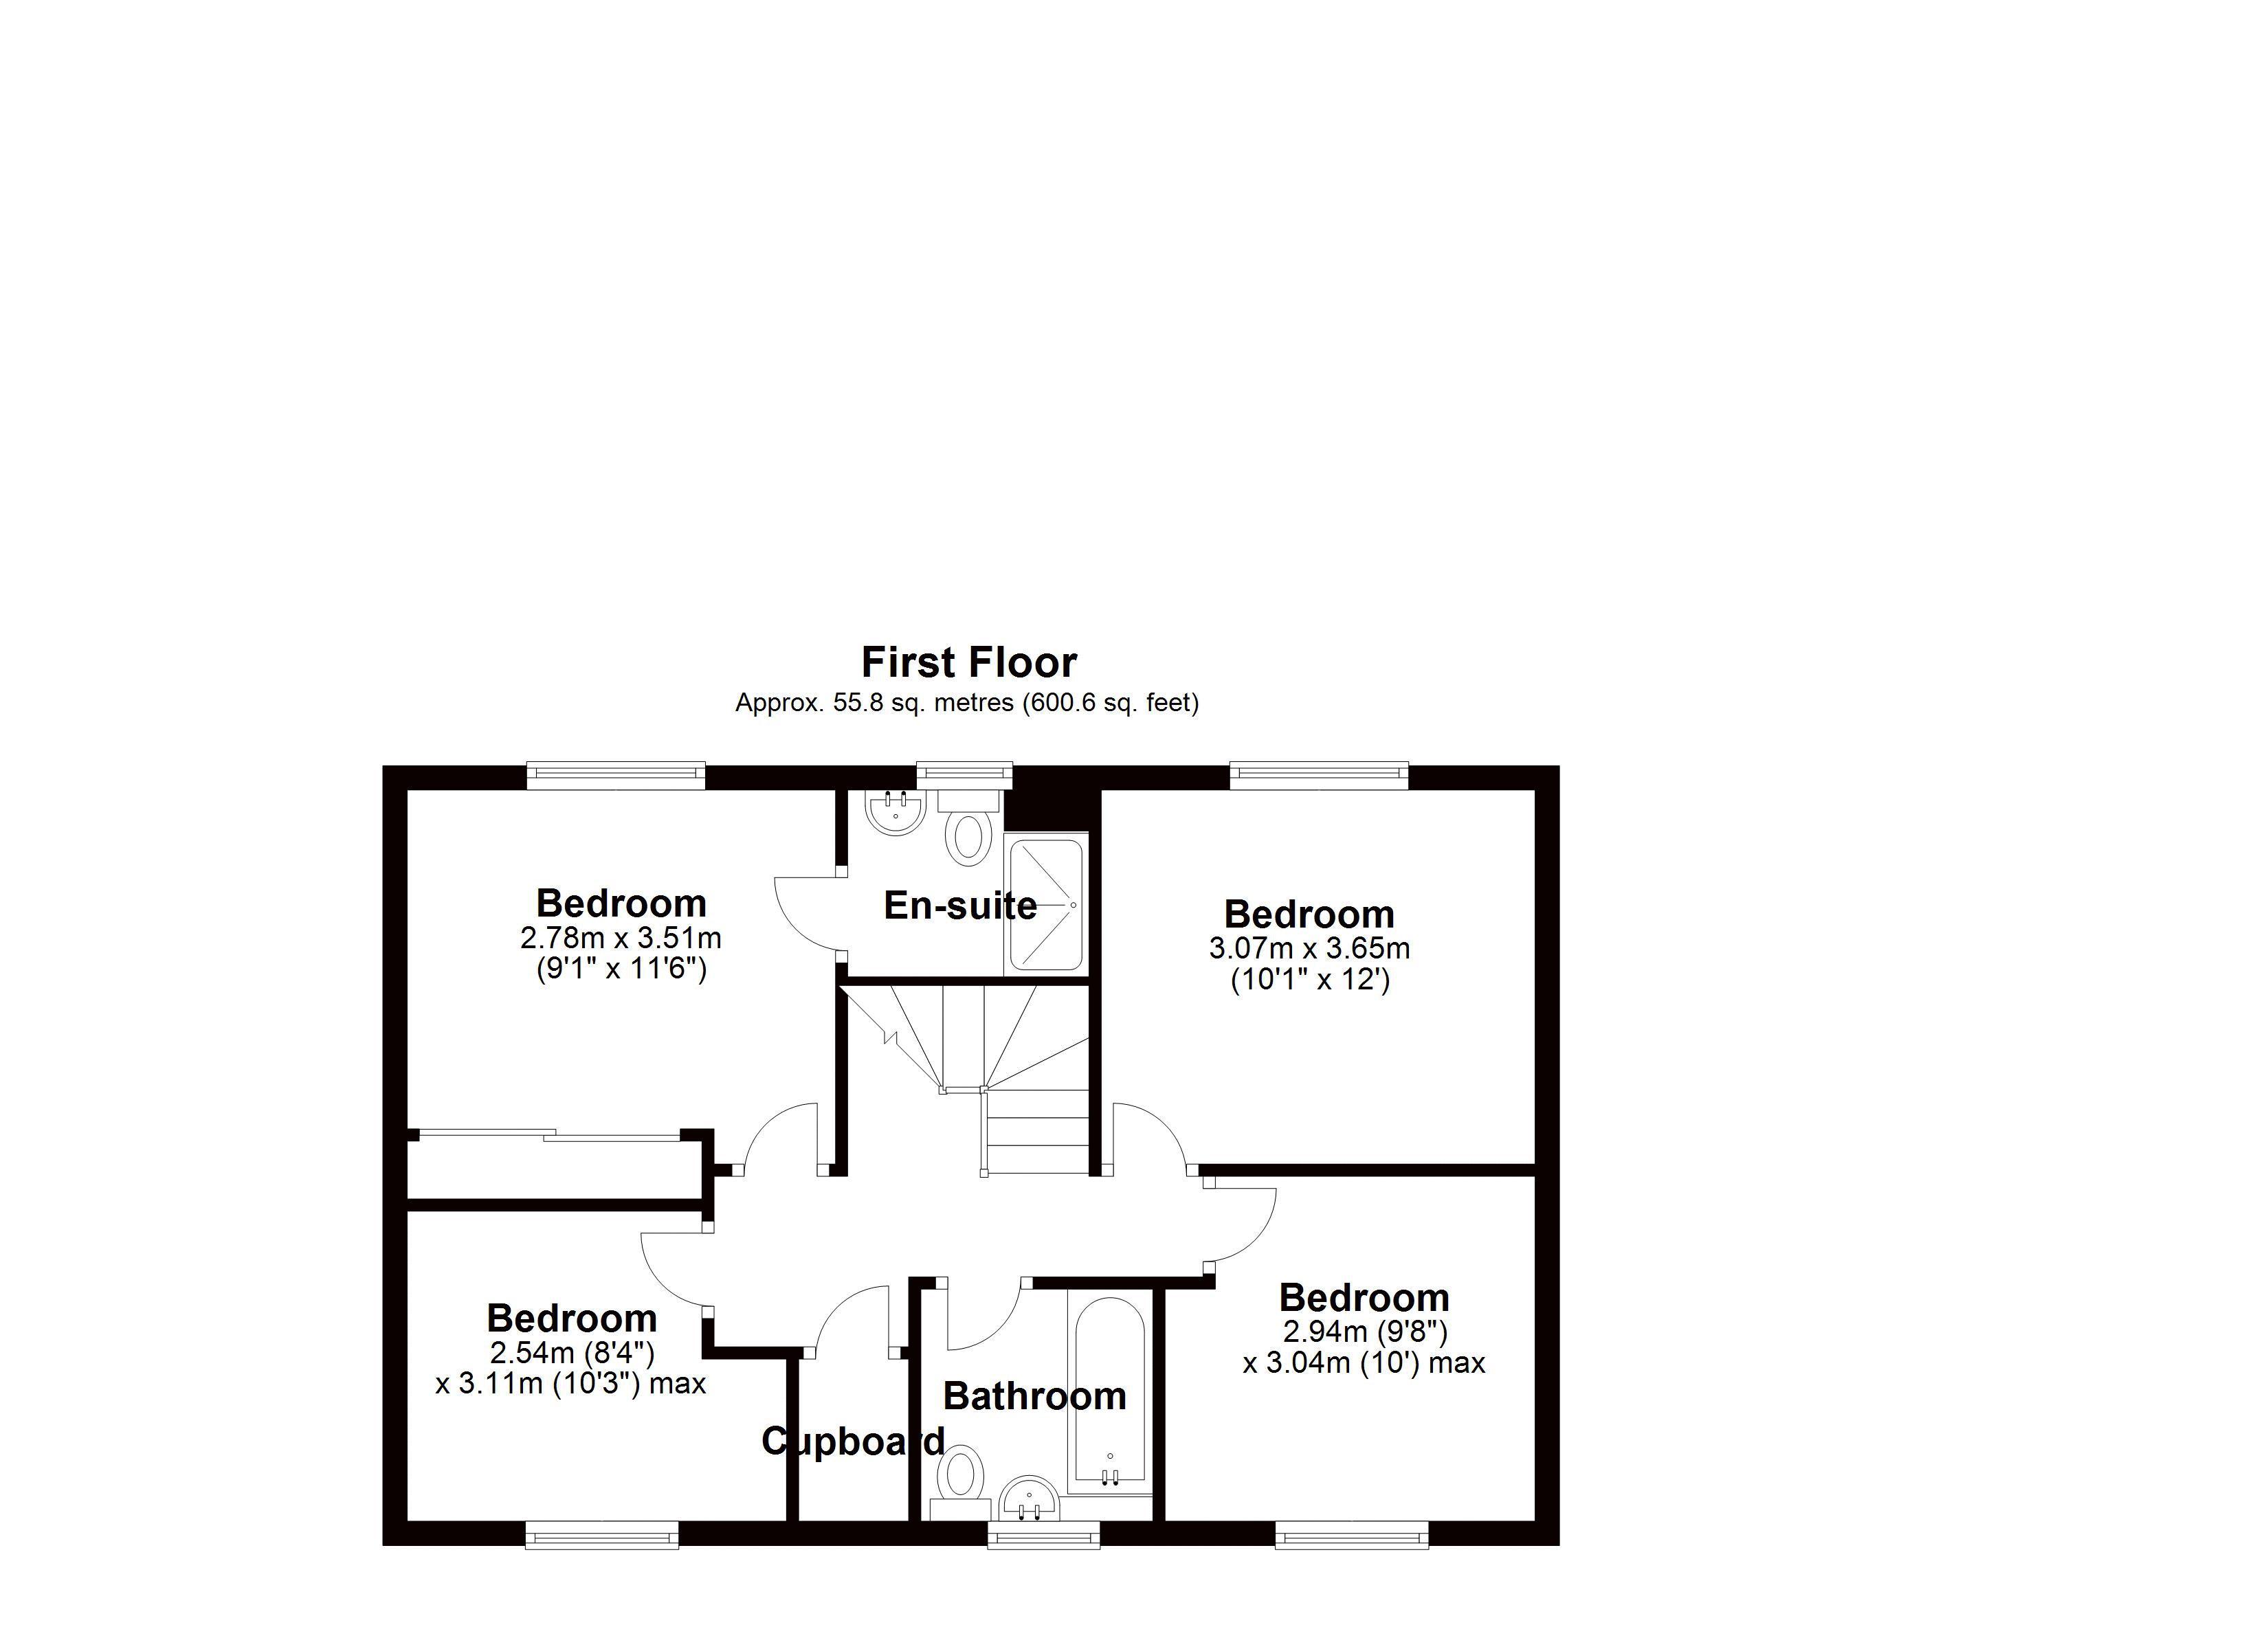 Beddall Way first floor plan